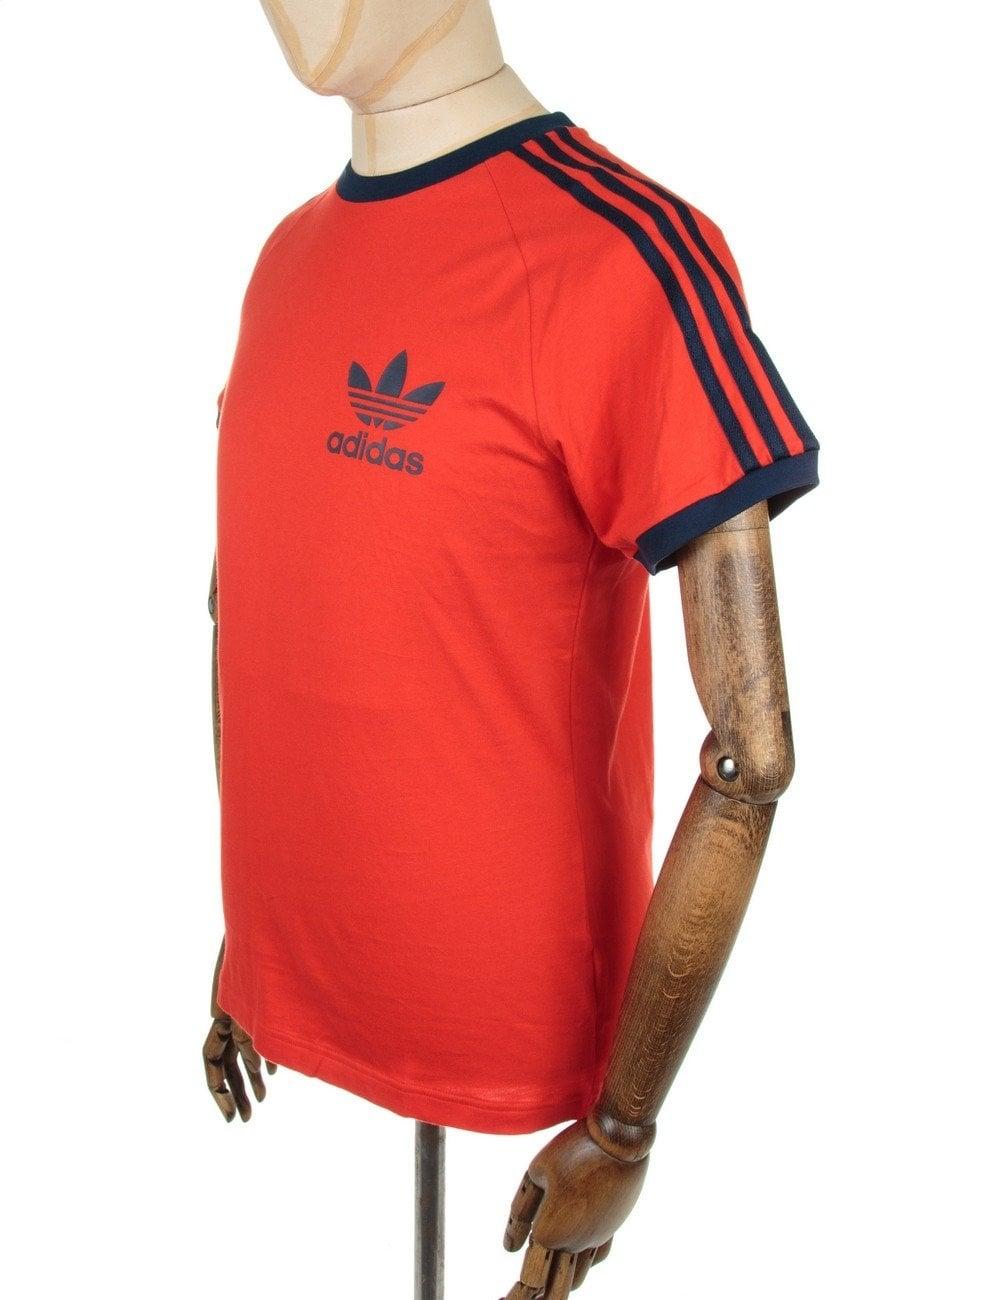 Cuestiones diplomáticas hasta ahora tengo hambre  Adidas Originals Retro Trefoil Logo T-shirt - Red - Clothing from Fat  Buddha Store UK